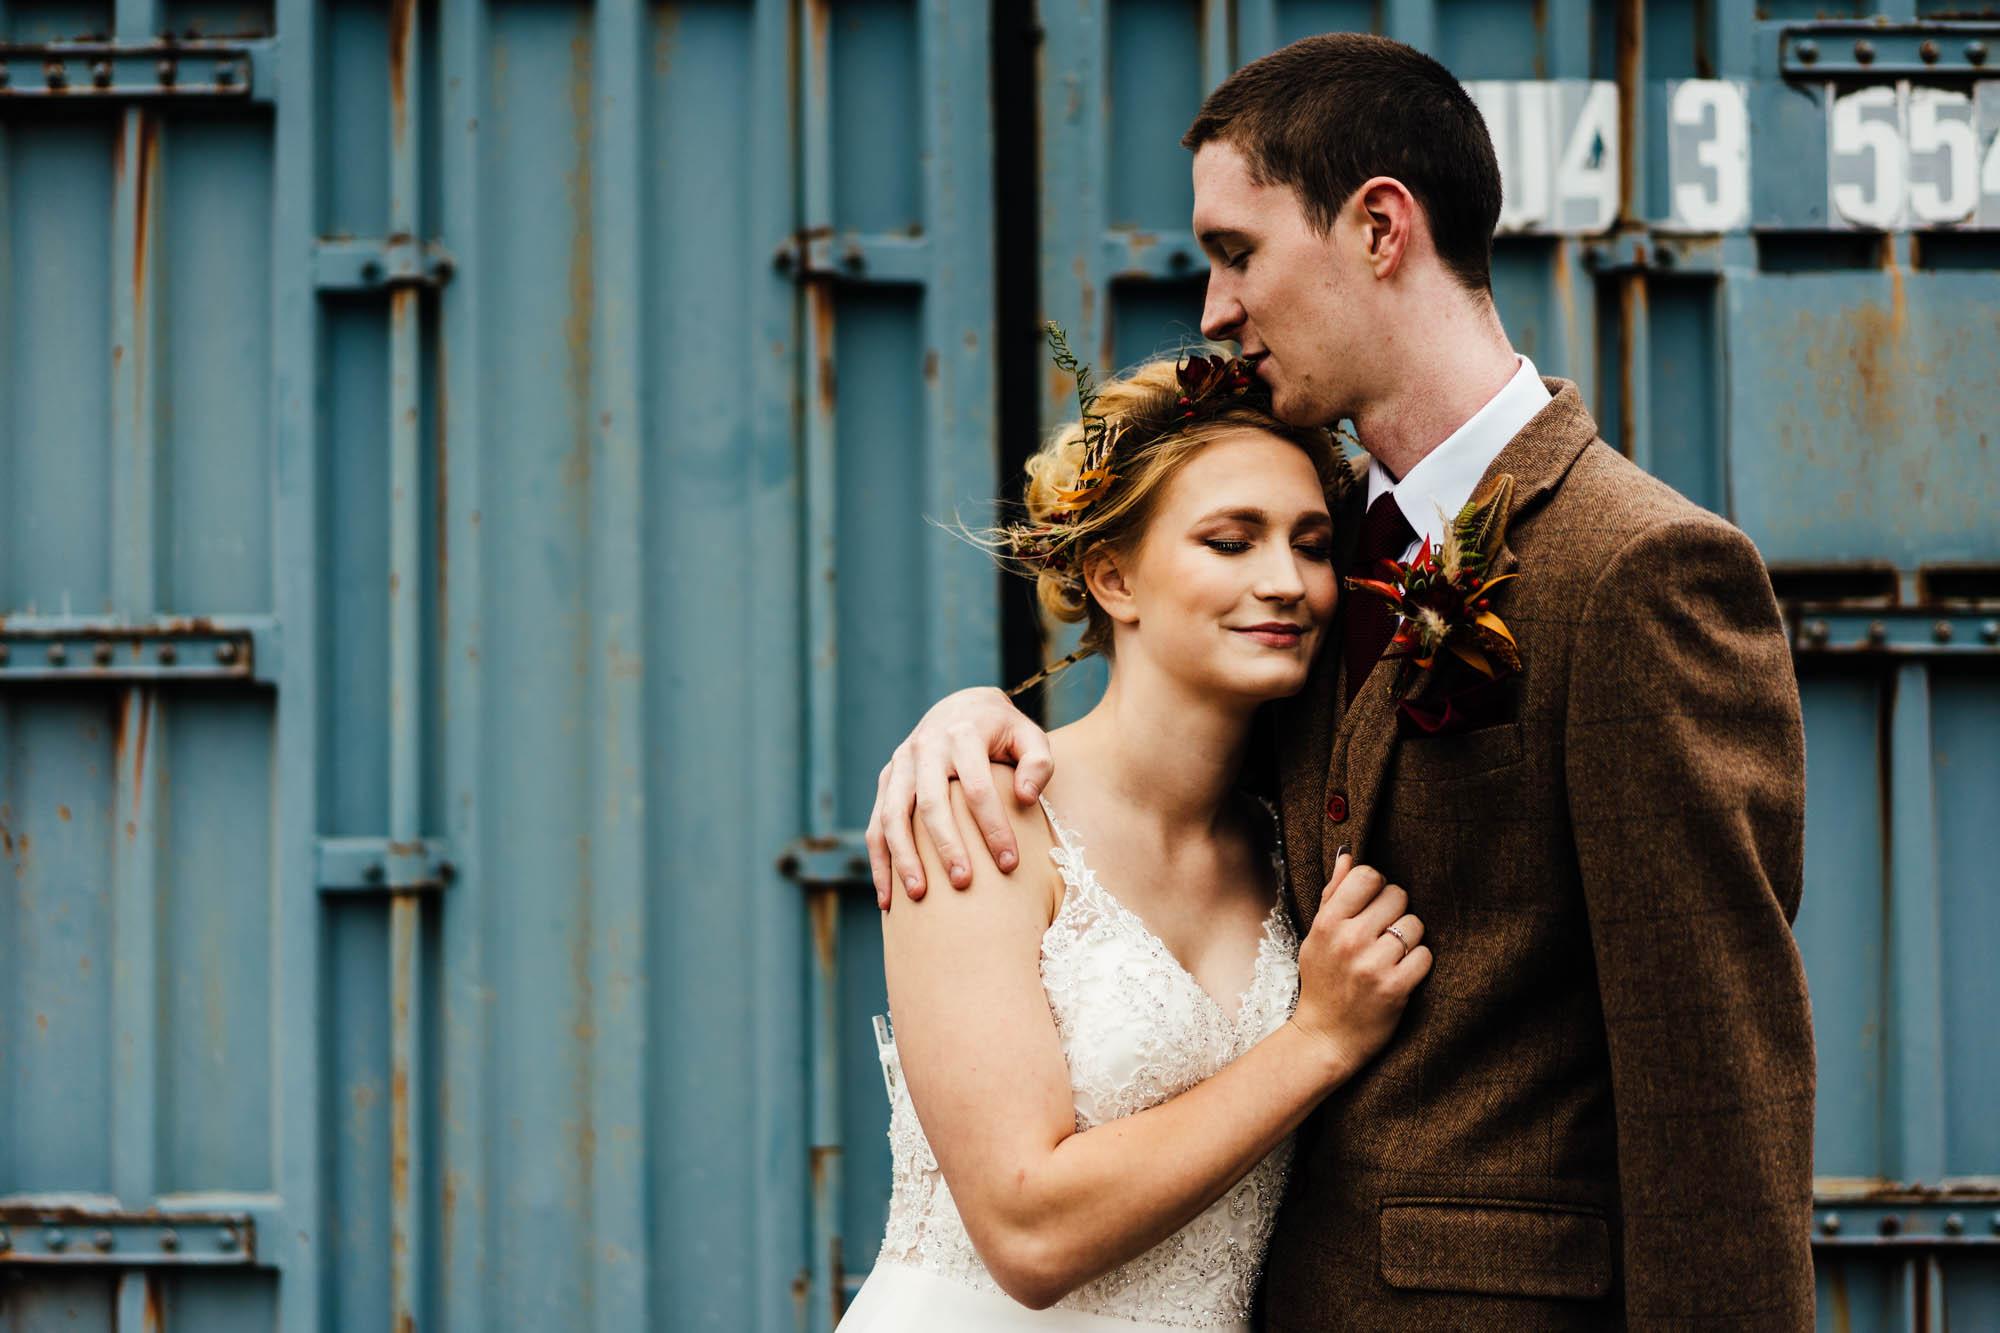 huntsmill-farm-wedding-inspiration-17